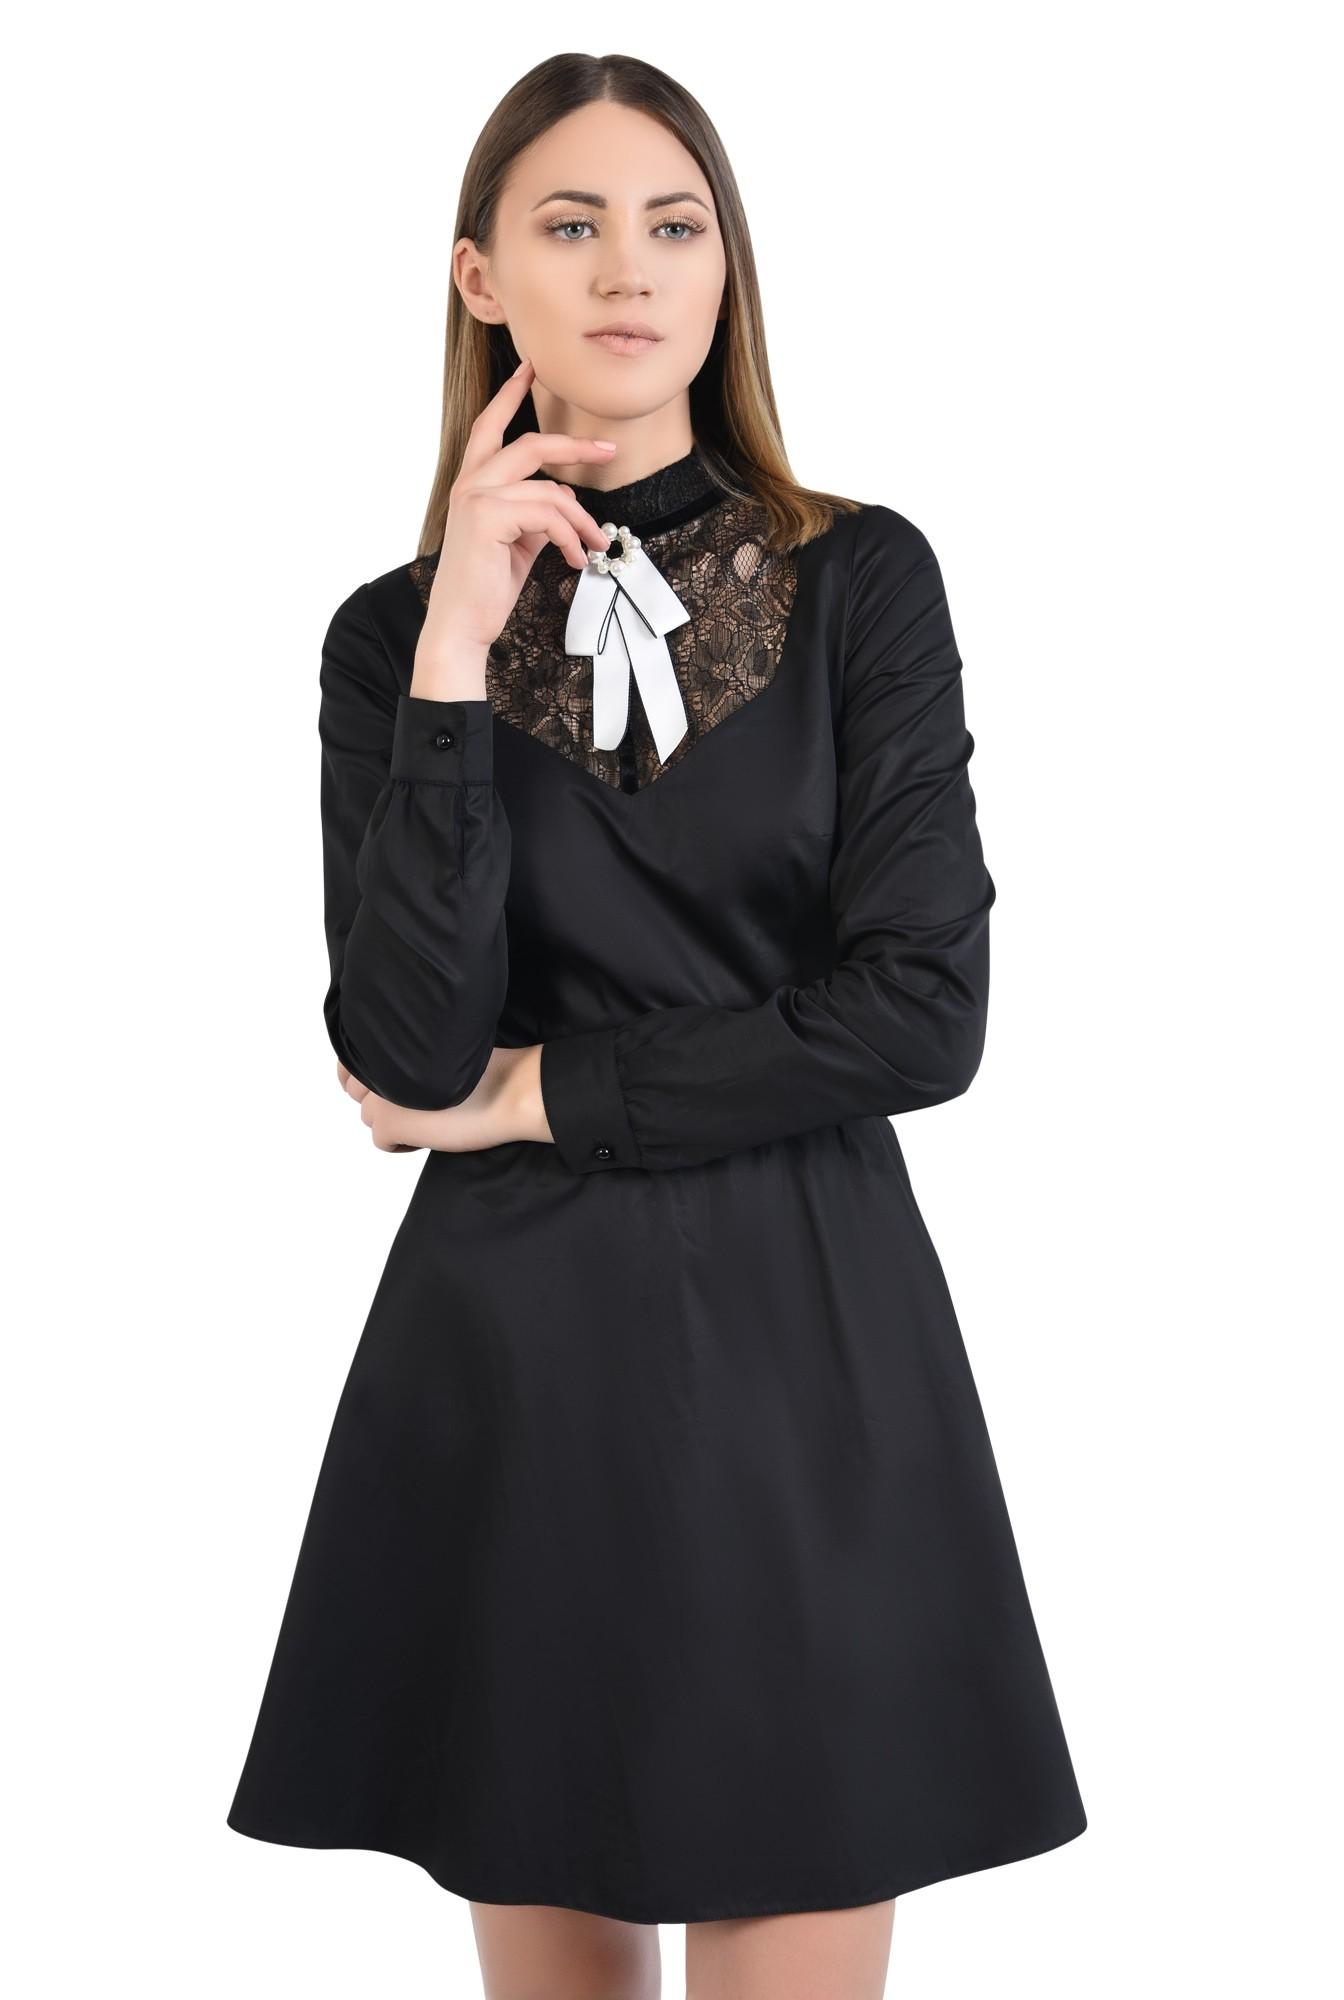 rochie neagra, cu platca din dantela, cu brosa, croi evazat